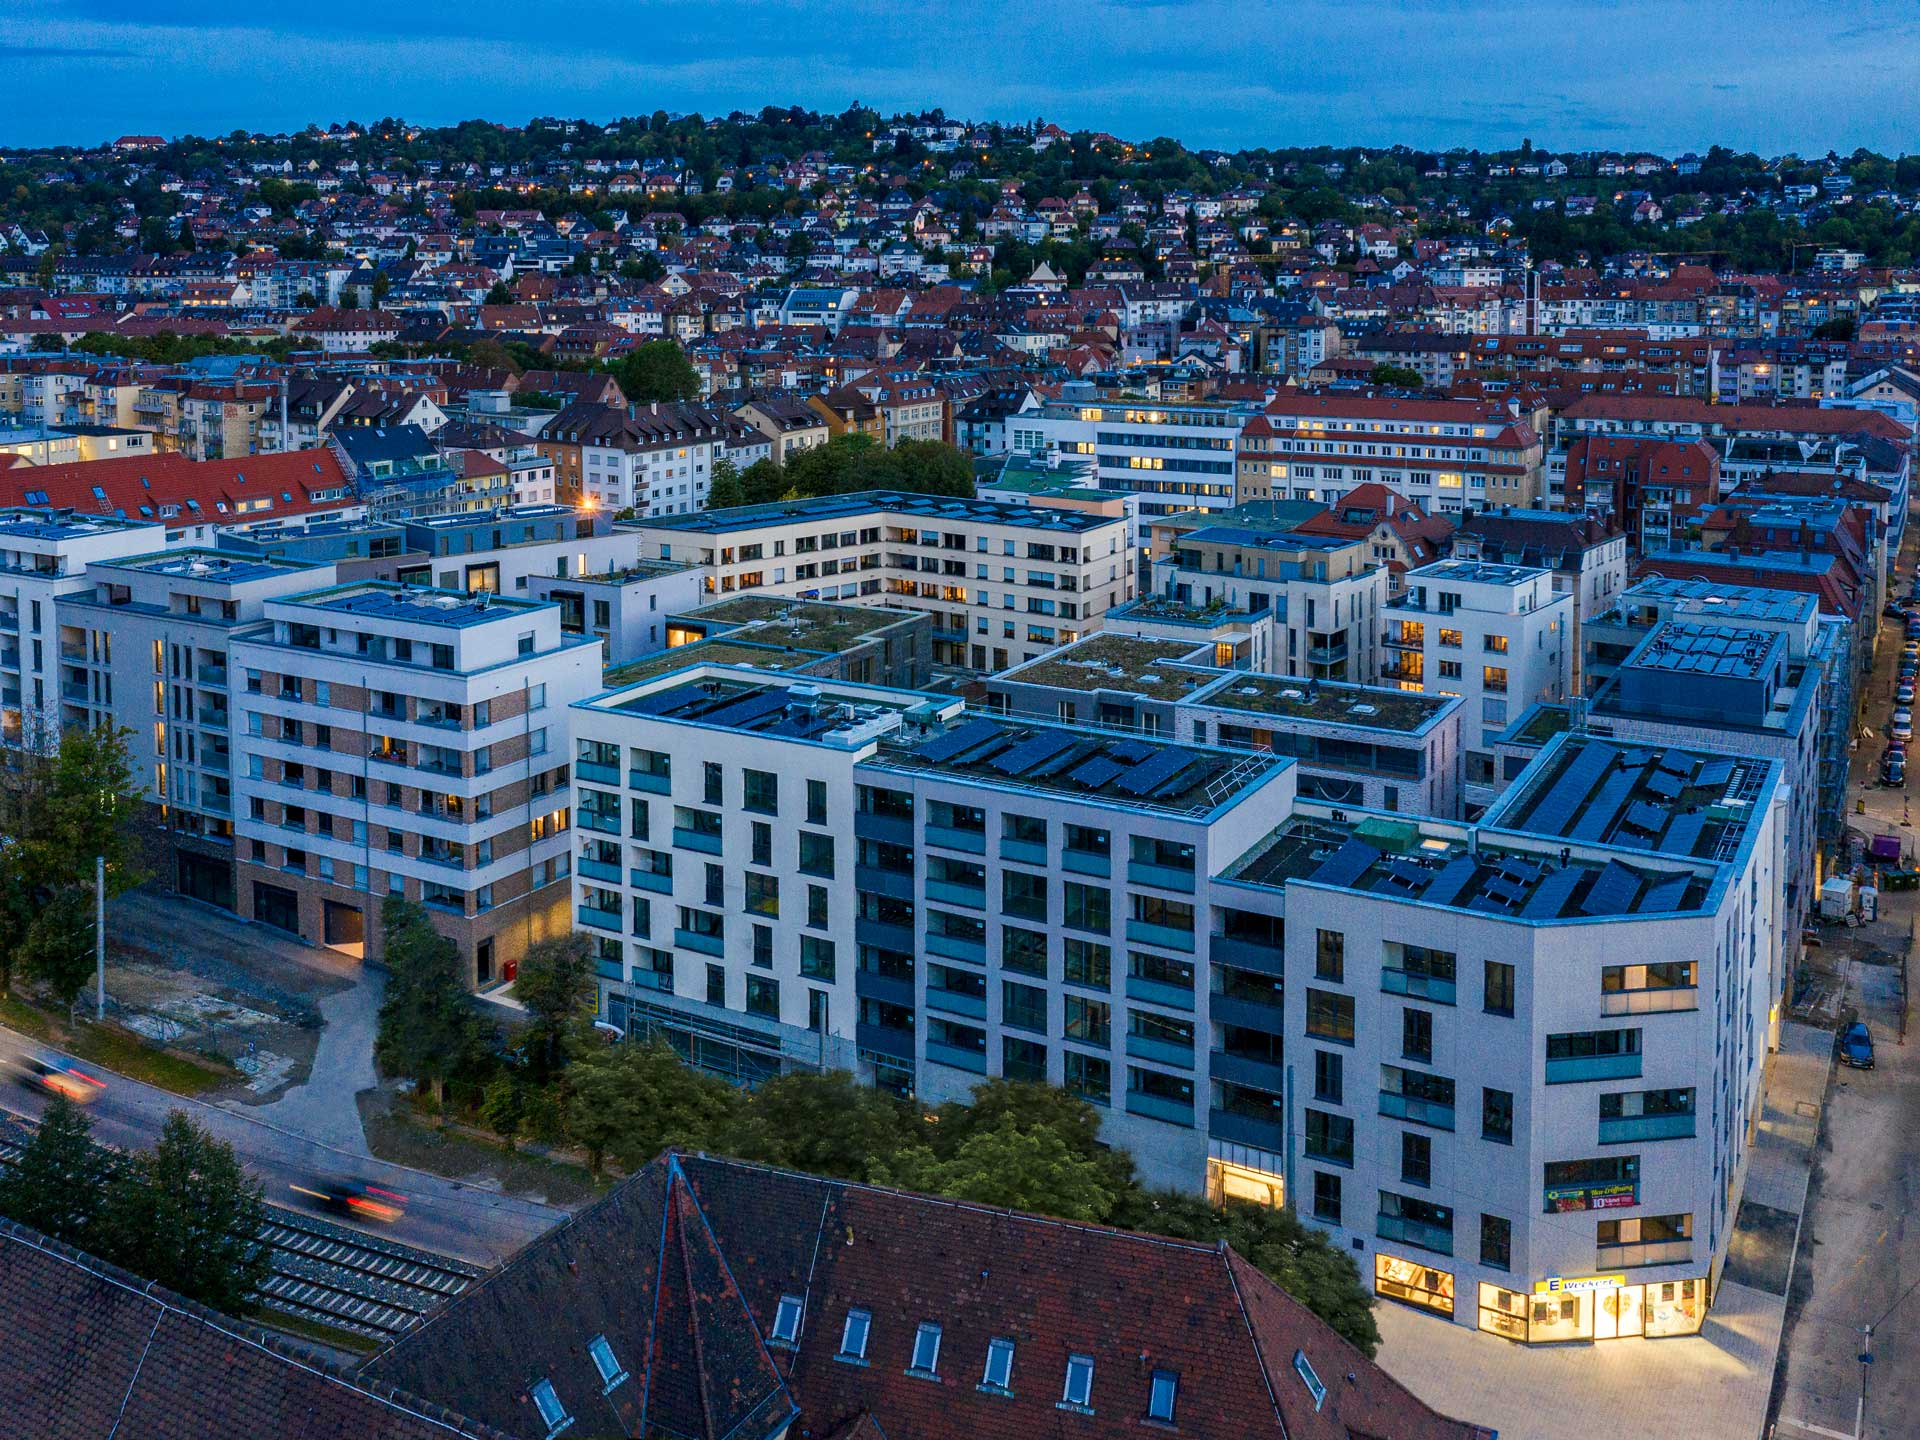 Stuttgart Olga Areal Energy Masterplan